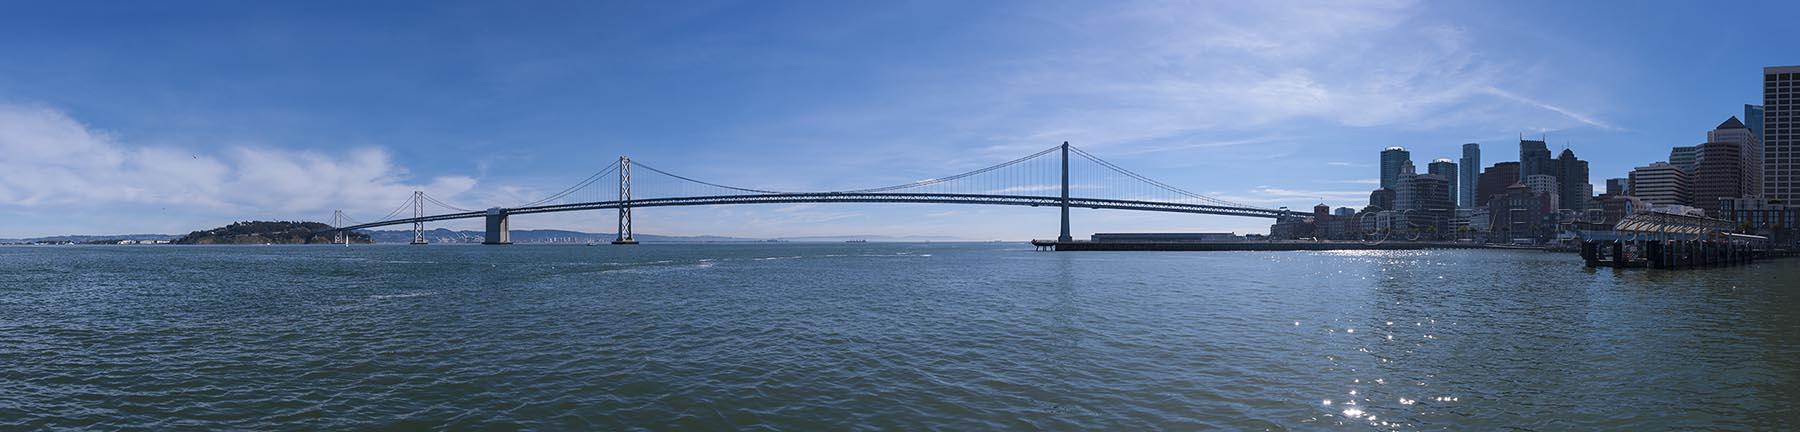 the Bay Bridge, San Francisco, California, photo by Steve Bruno